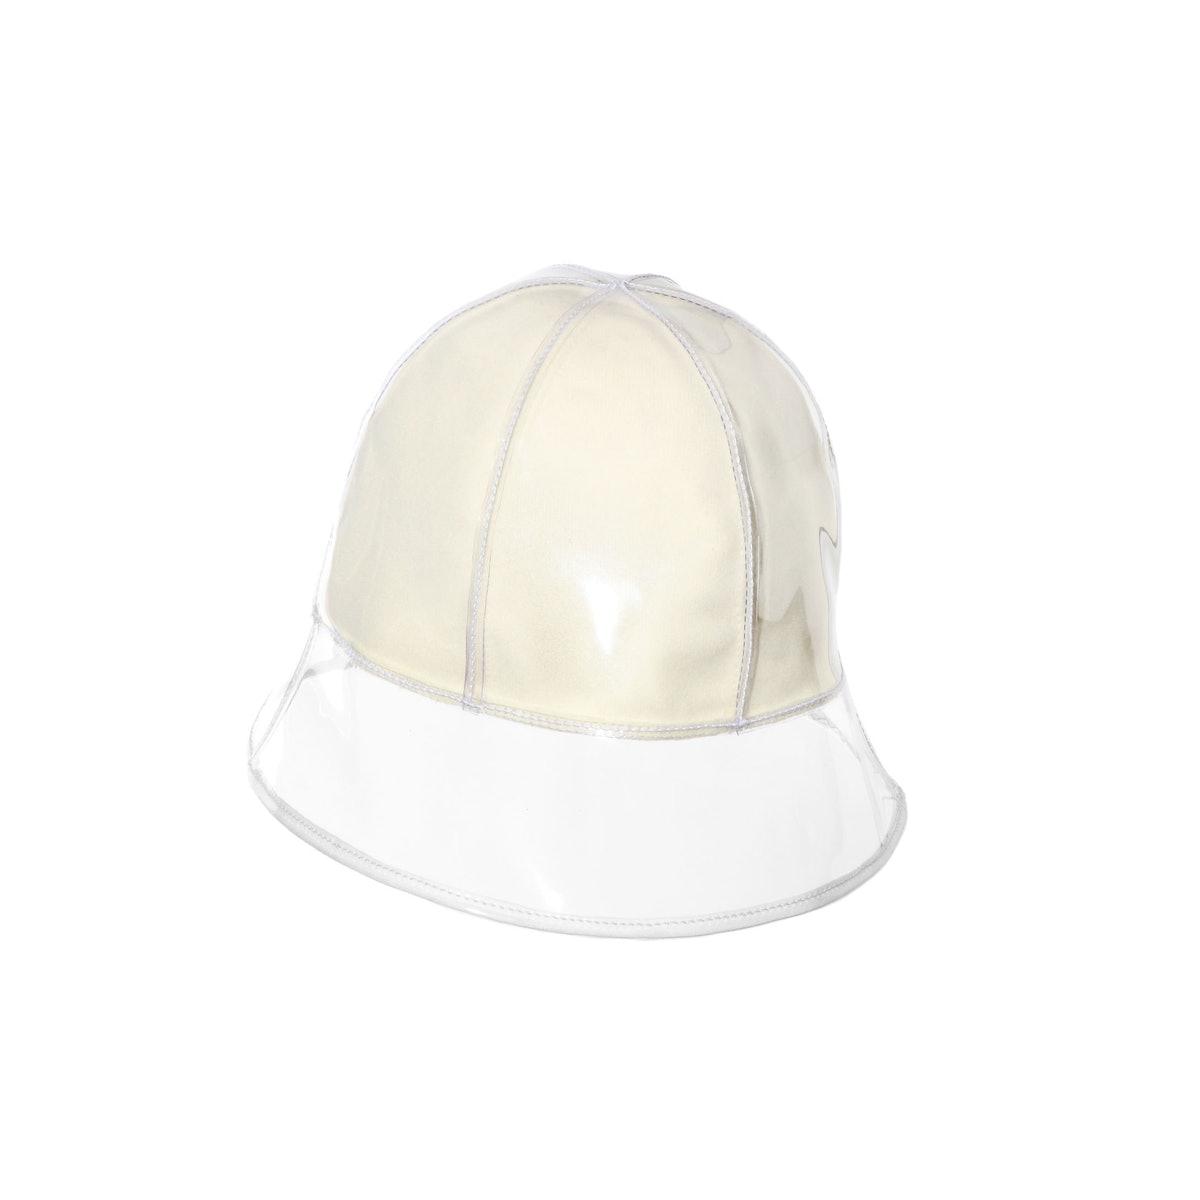 Lika hat